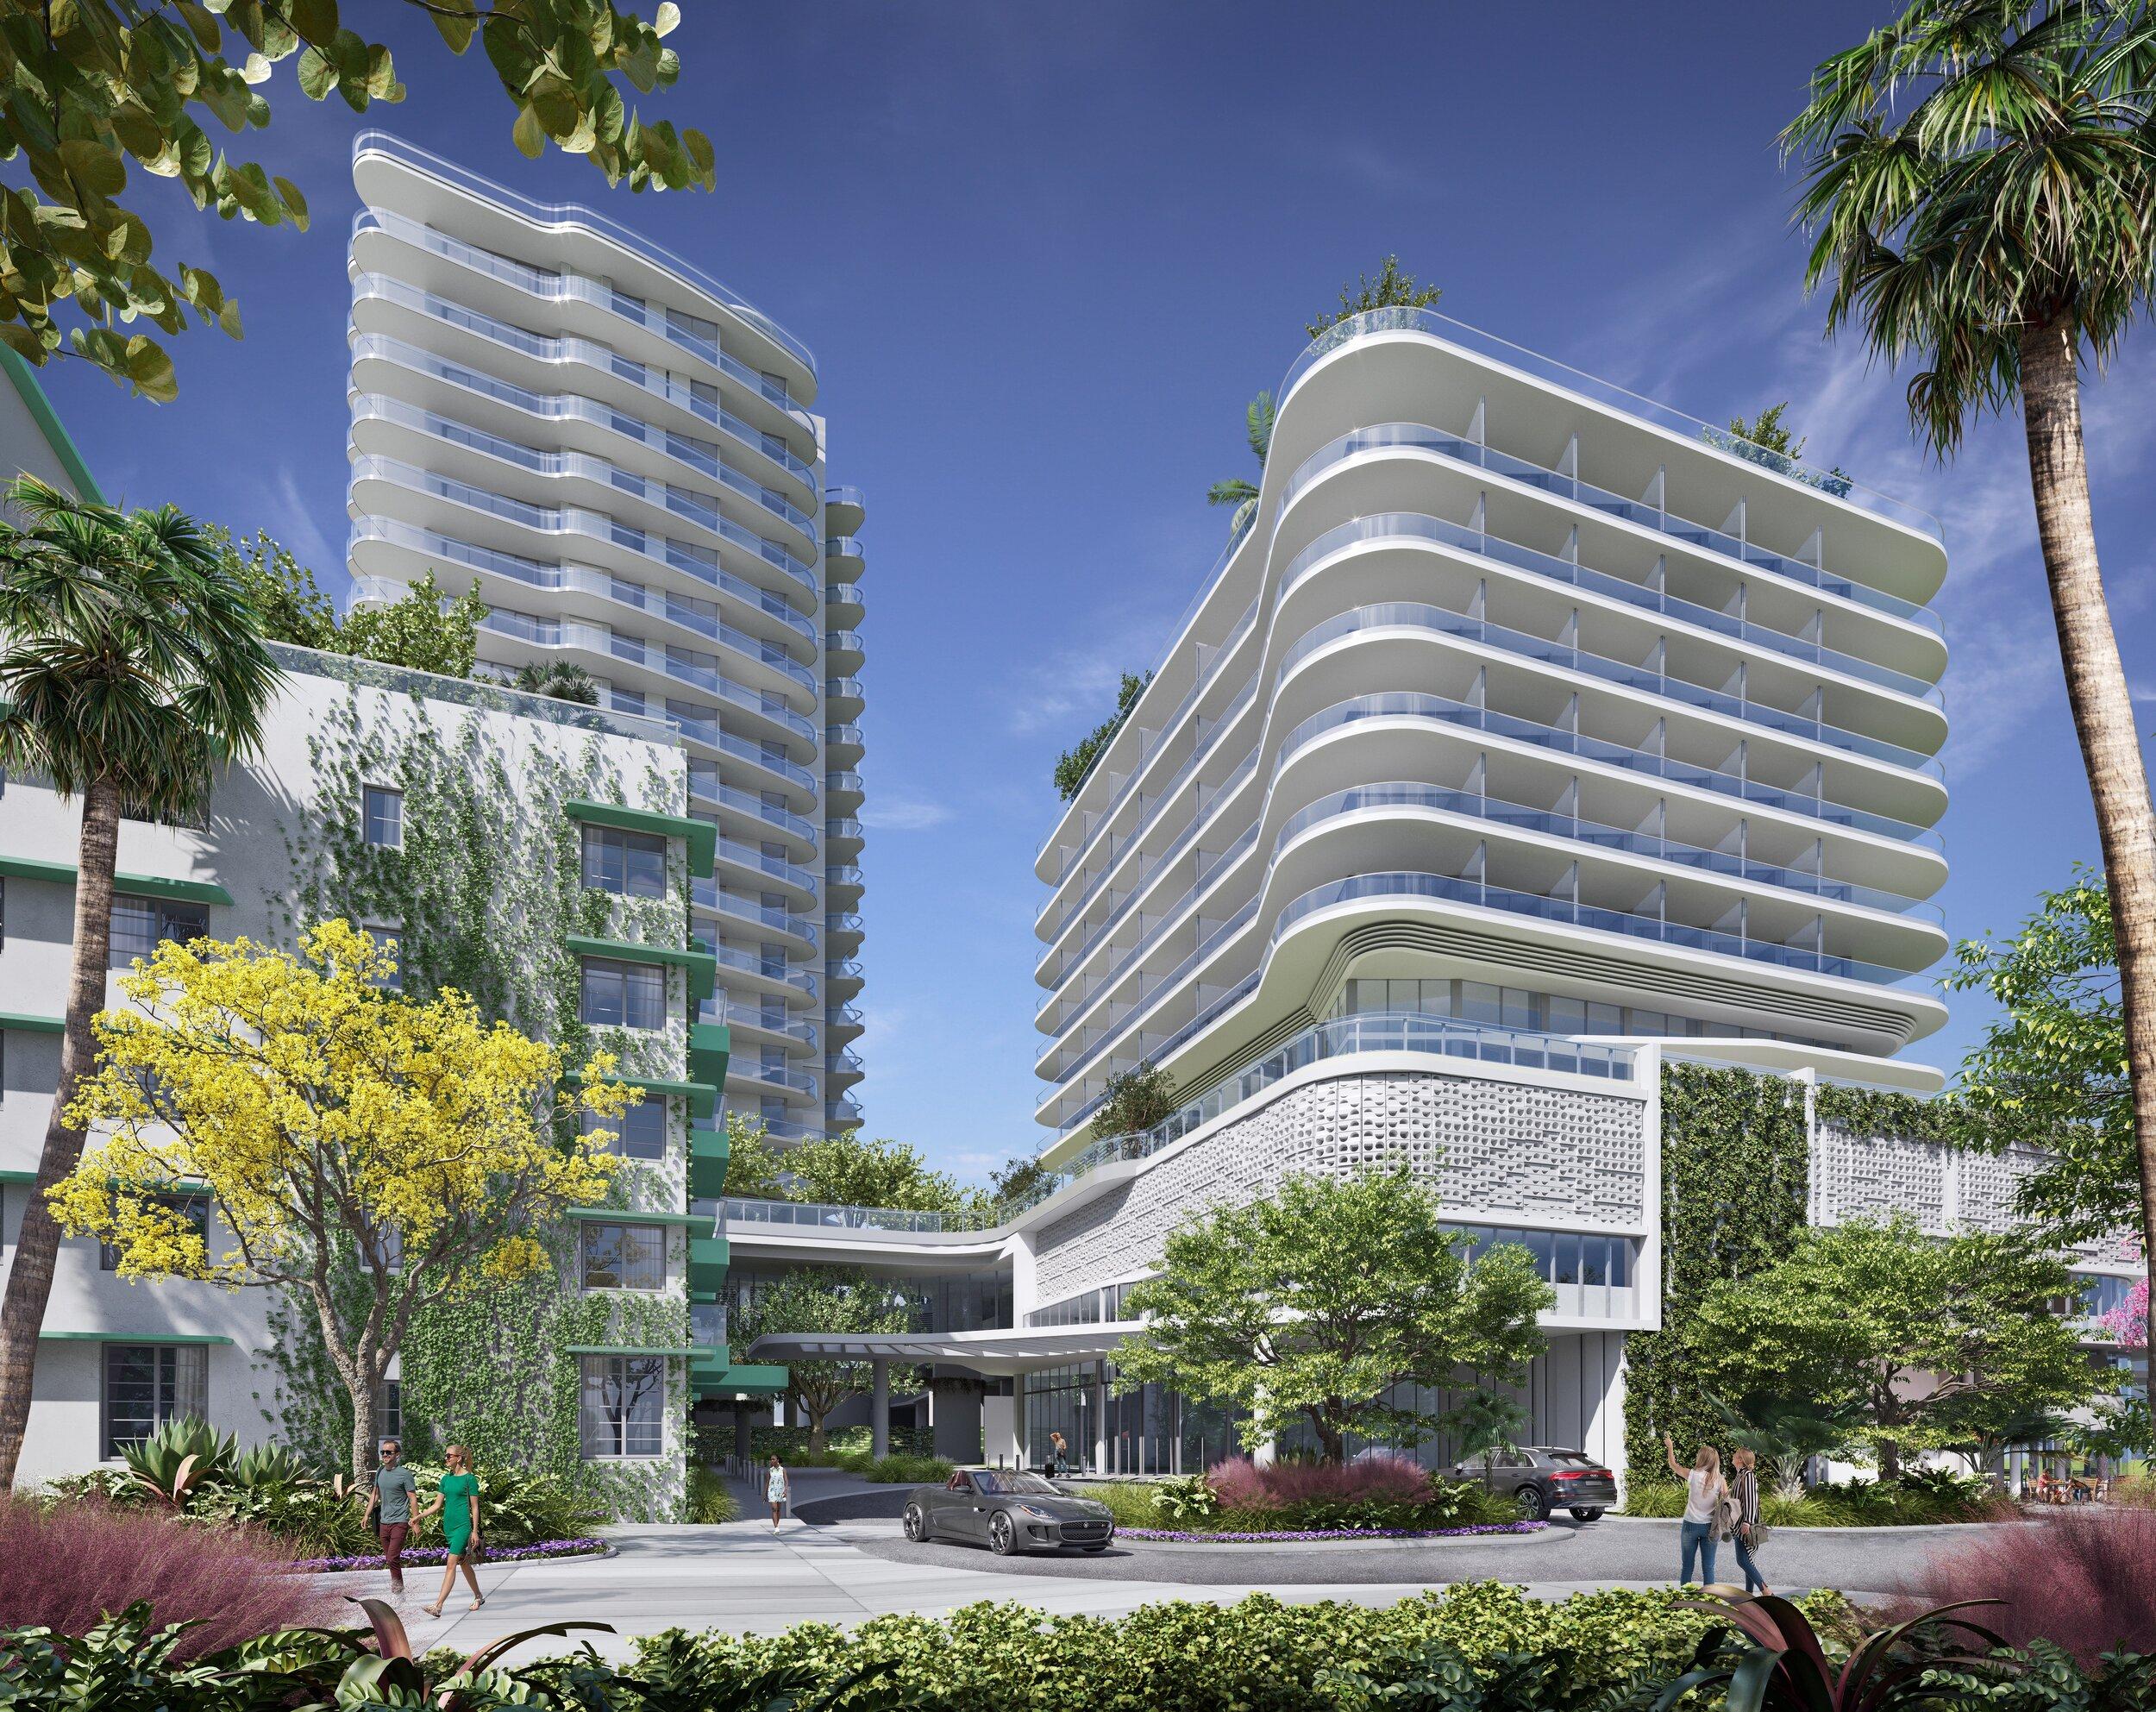 Ocean Terrace. Designed by Revuelta Architecture International.